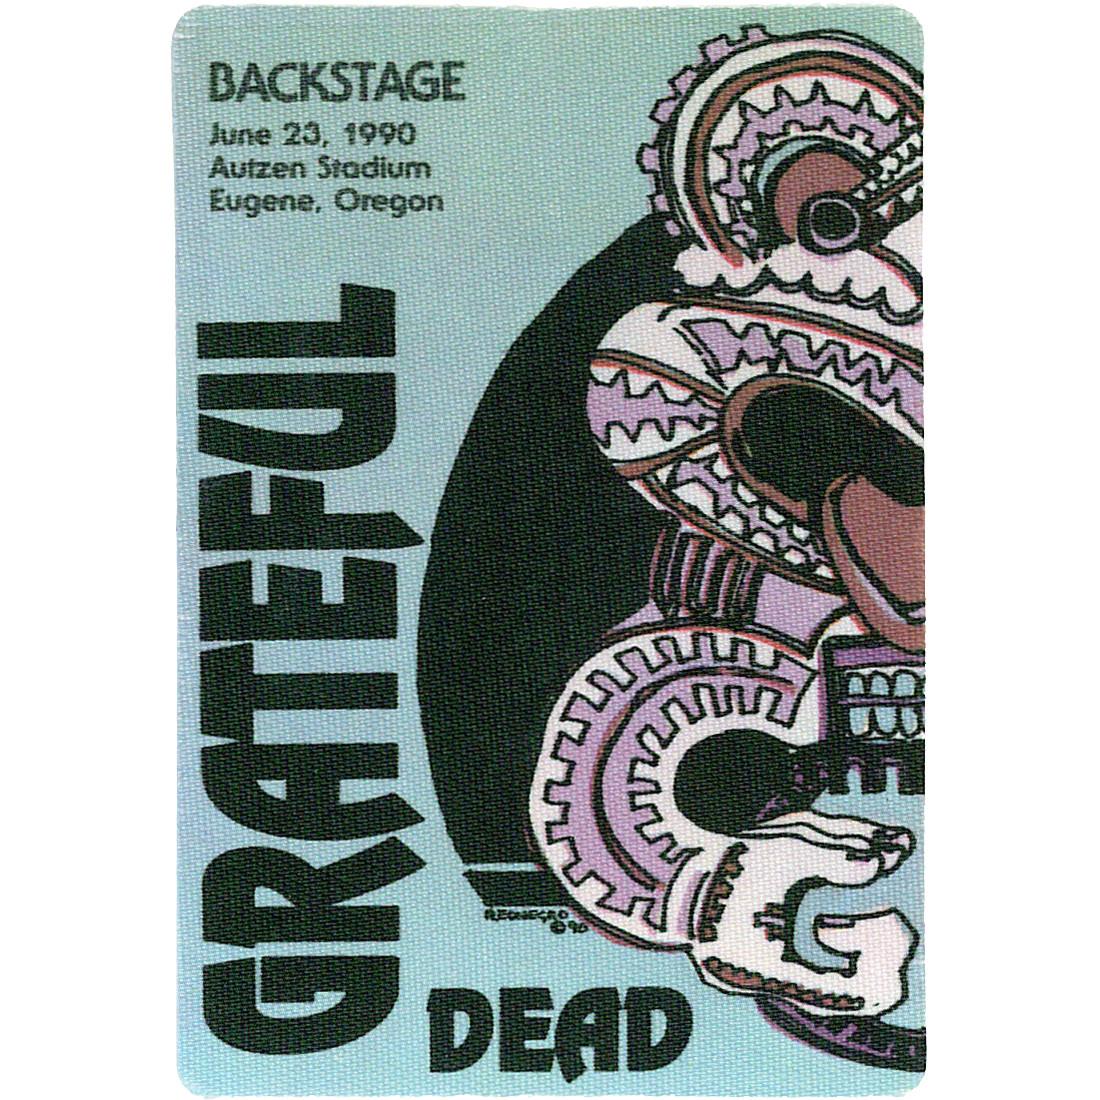 Grateful Dead 1990 06-23 Backstage Pass